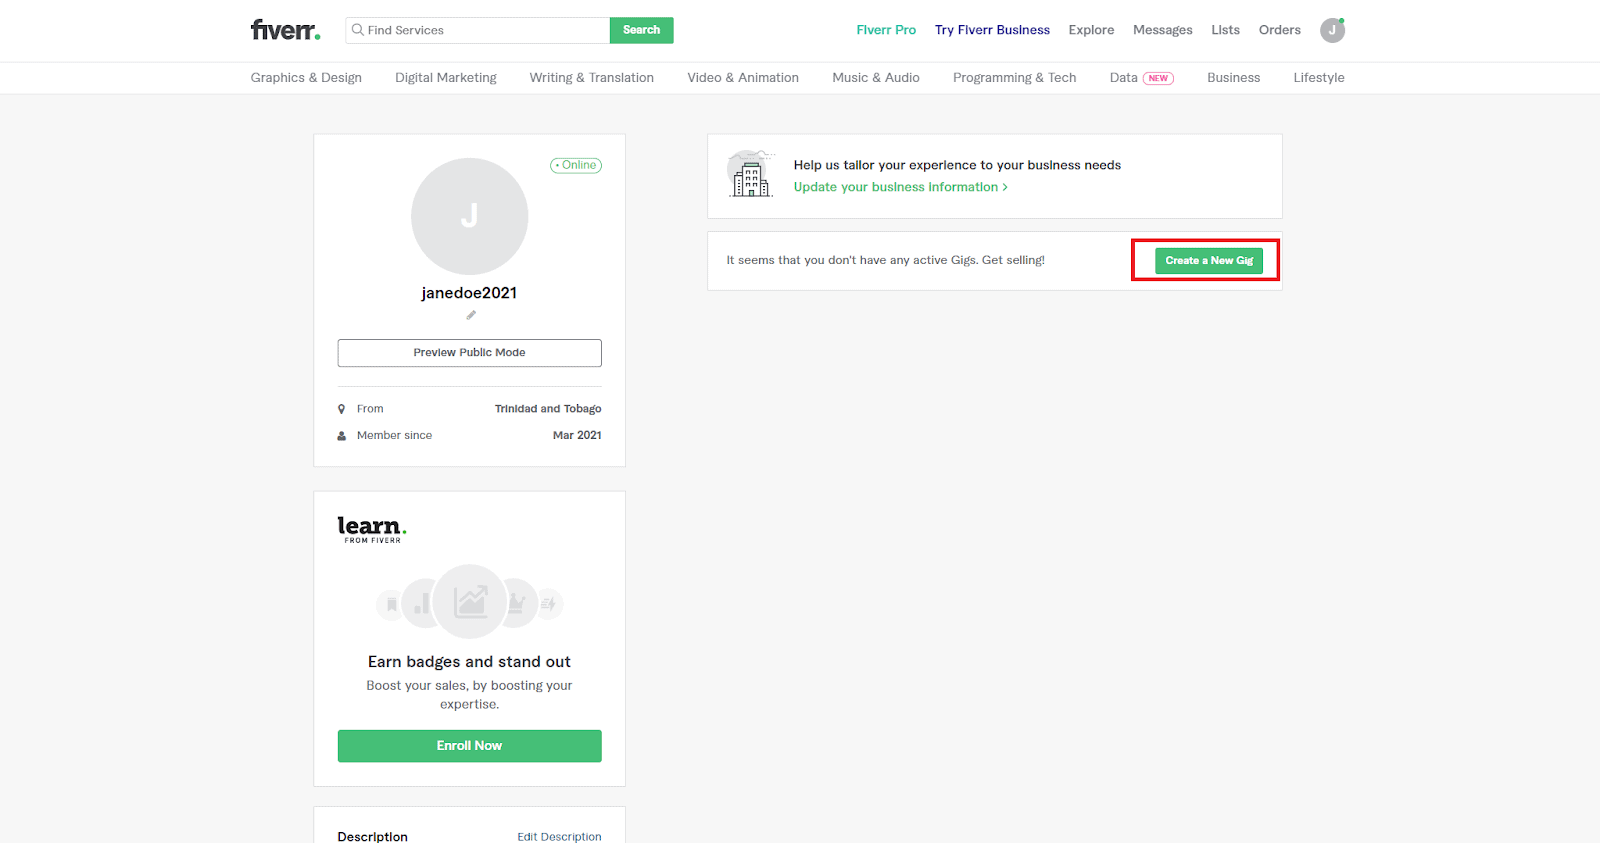 Fiverr screenshot - profile edit